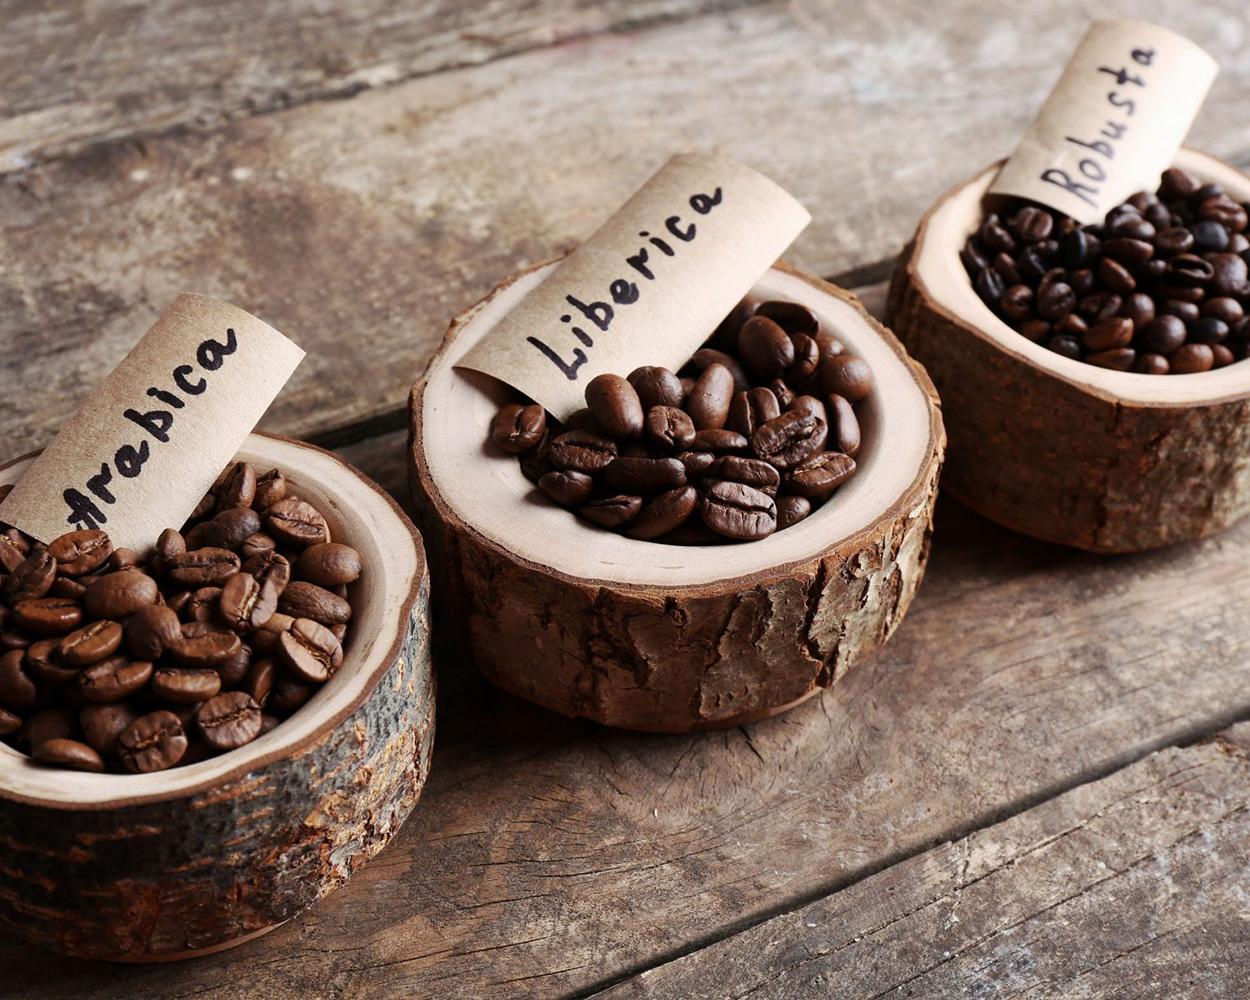 Verschil tussen Robusta en Arabica koffiebonen